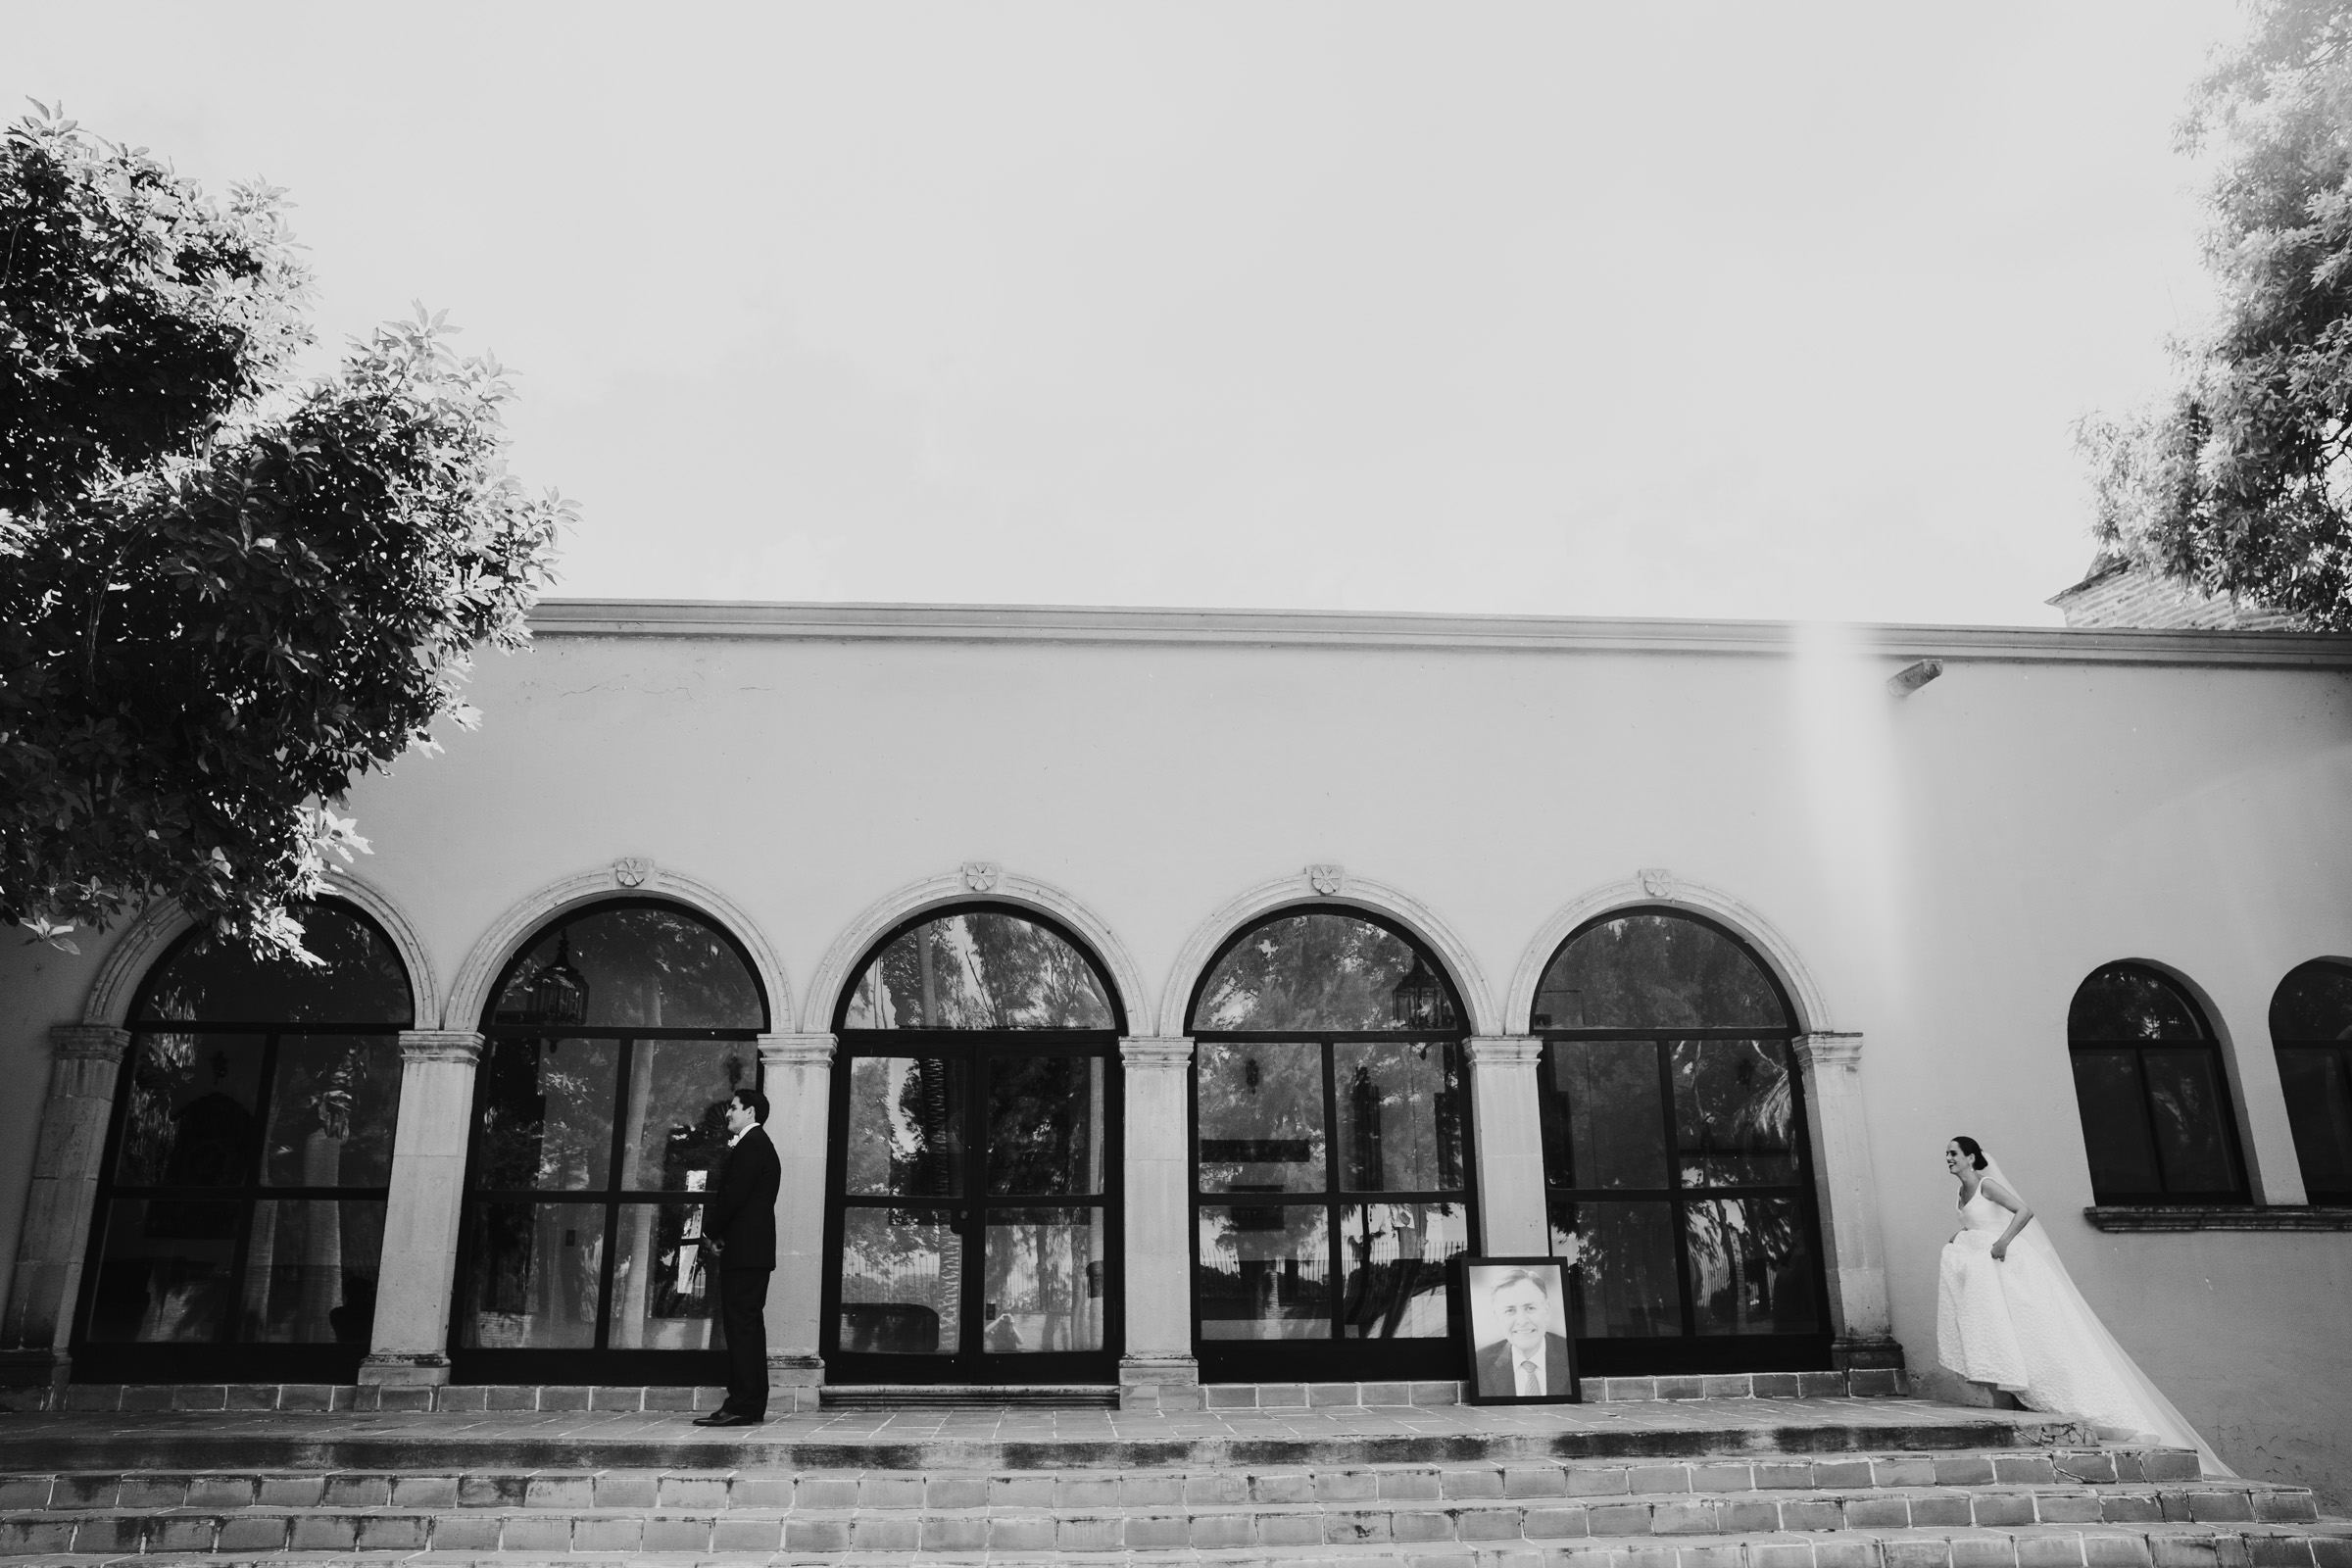 Boda-Celaya-Hacienda-Mexico-Fotografia-Pierce--13.jpg